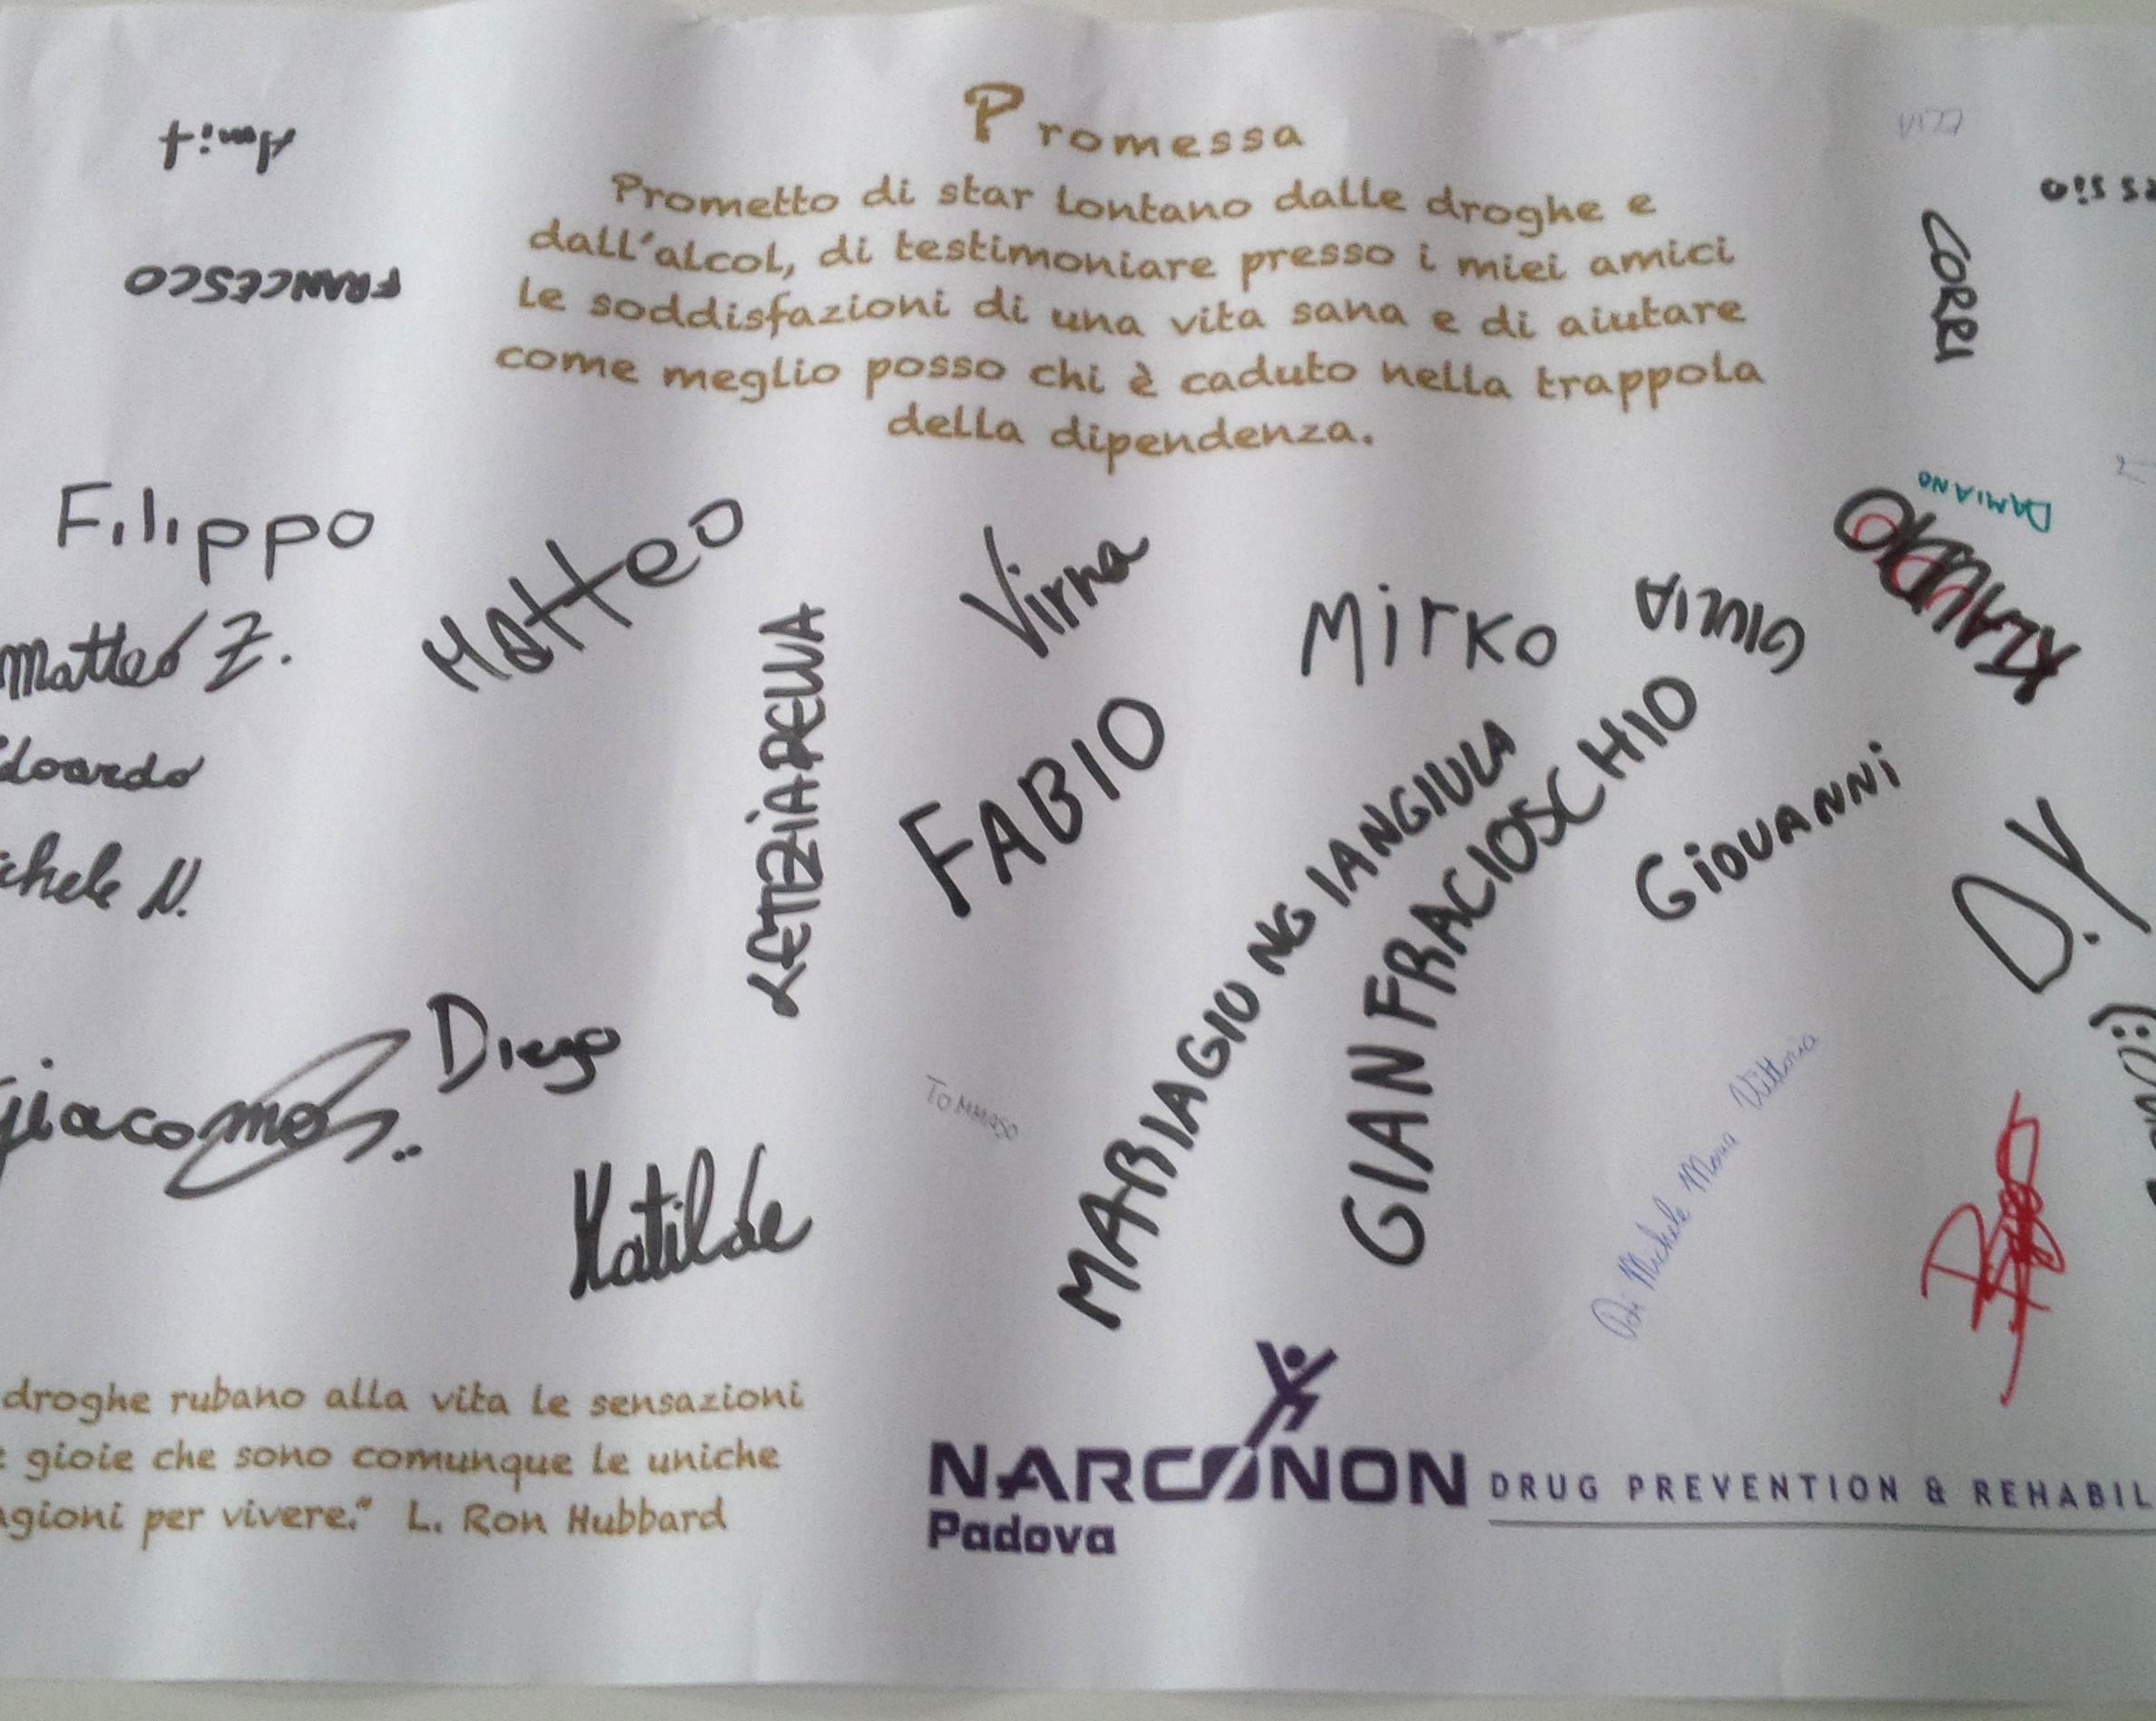 Promessa studenti Padova